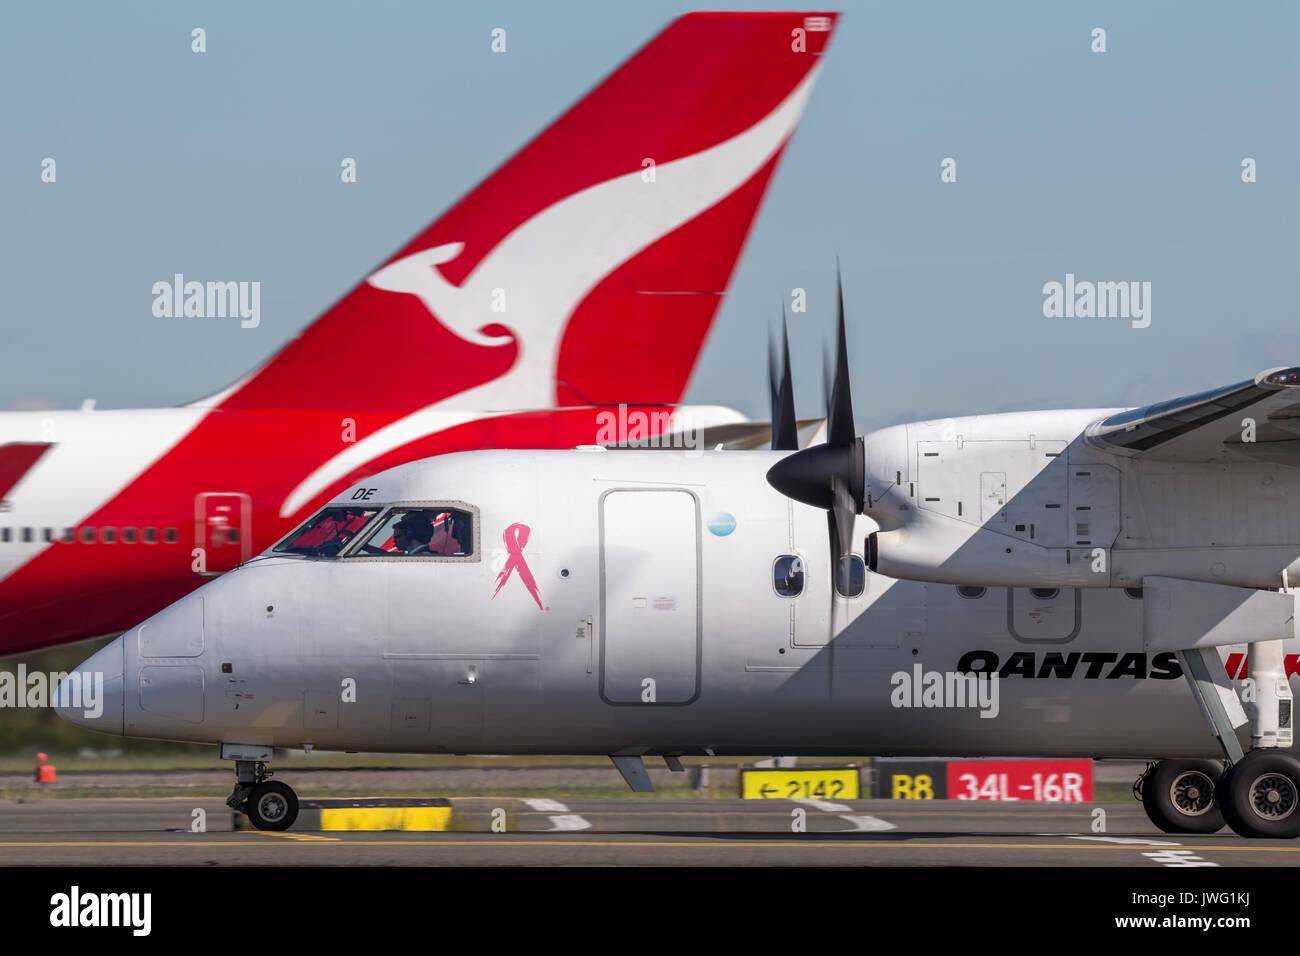 QantasLink Dehavilland DHC-8 (Dash 8) twin engined regional airliner at Sydney Airport. - Stock Image